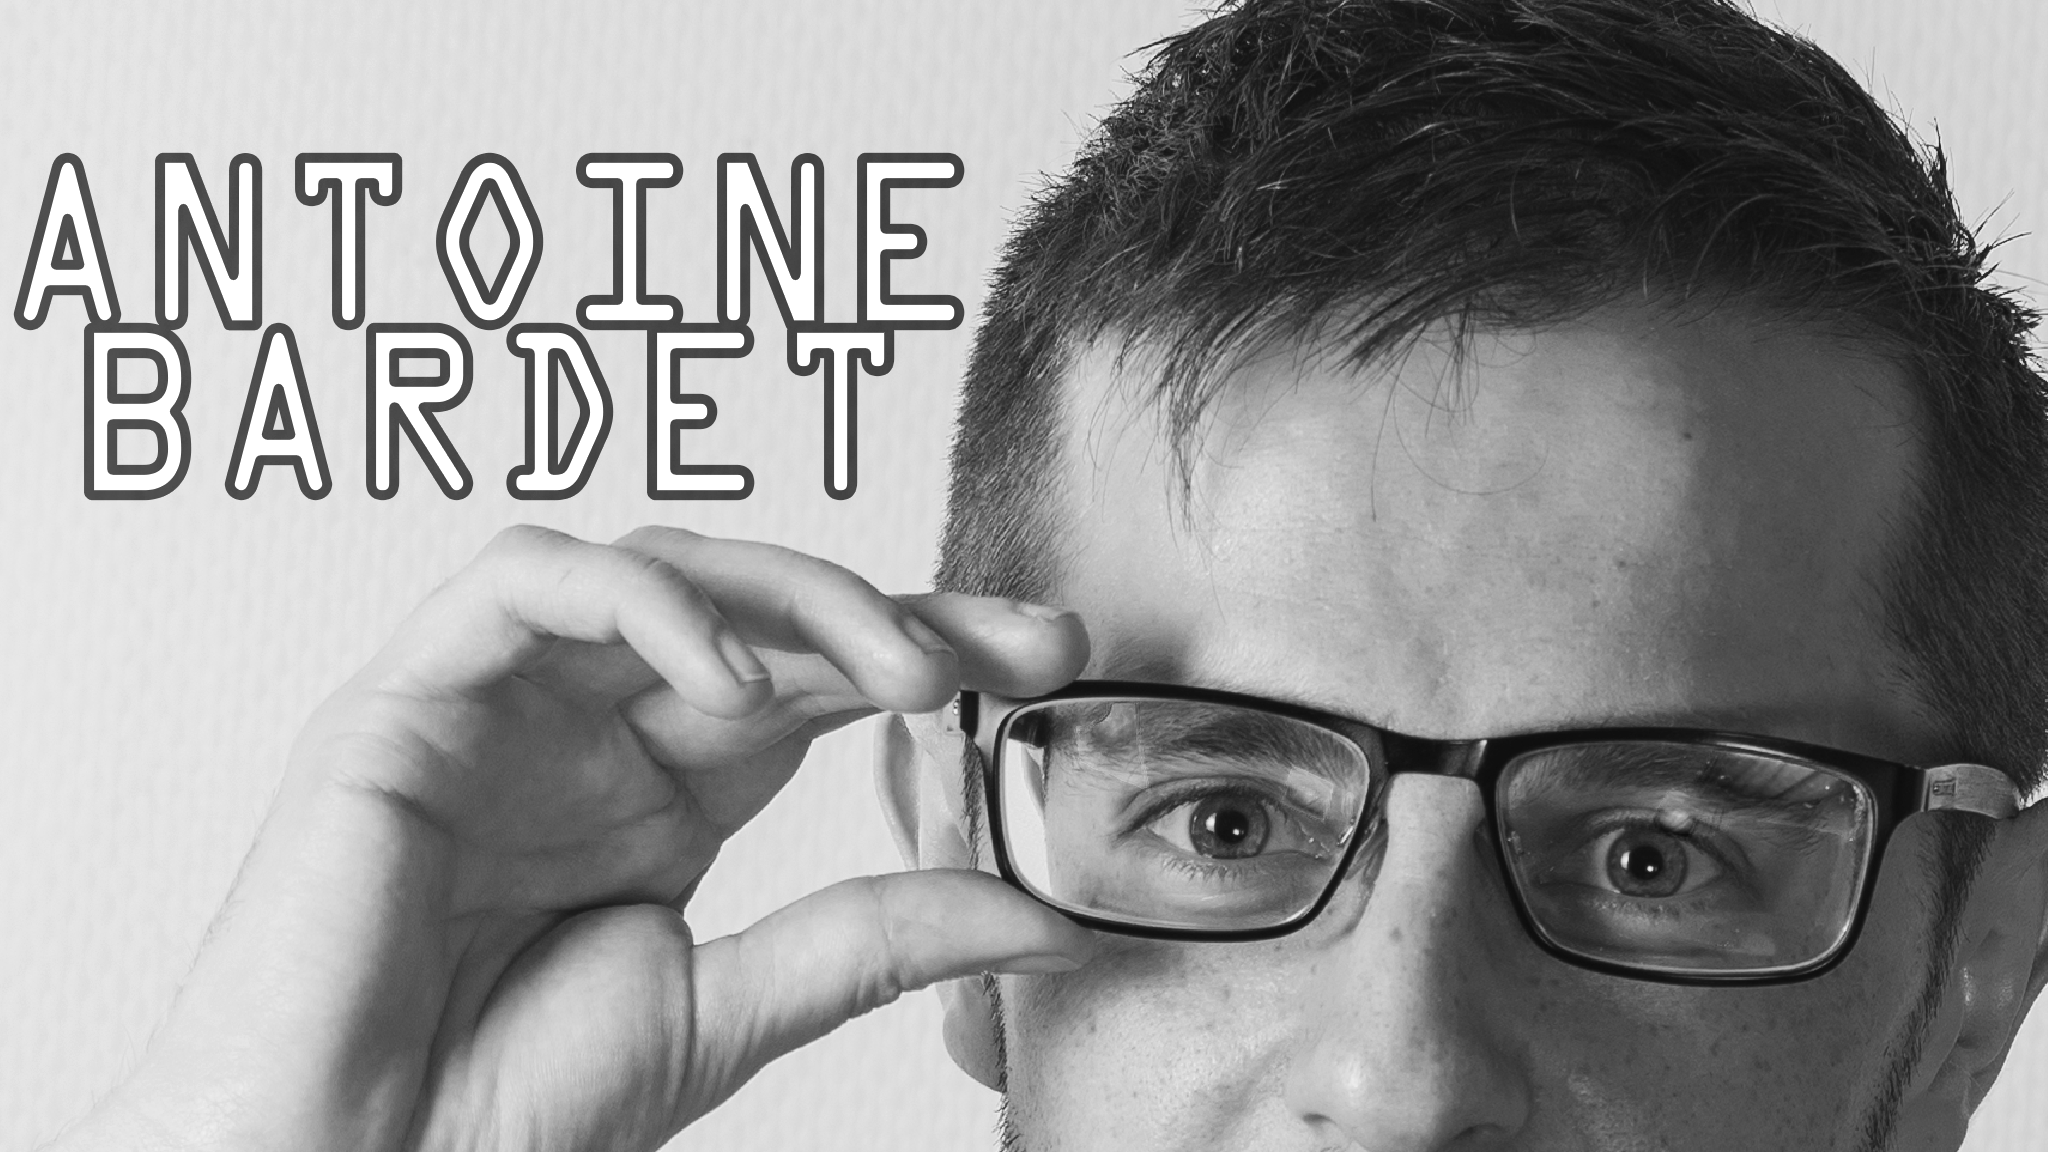 Le Blog d'Antoine Bardet !